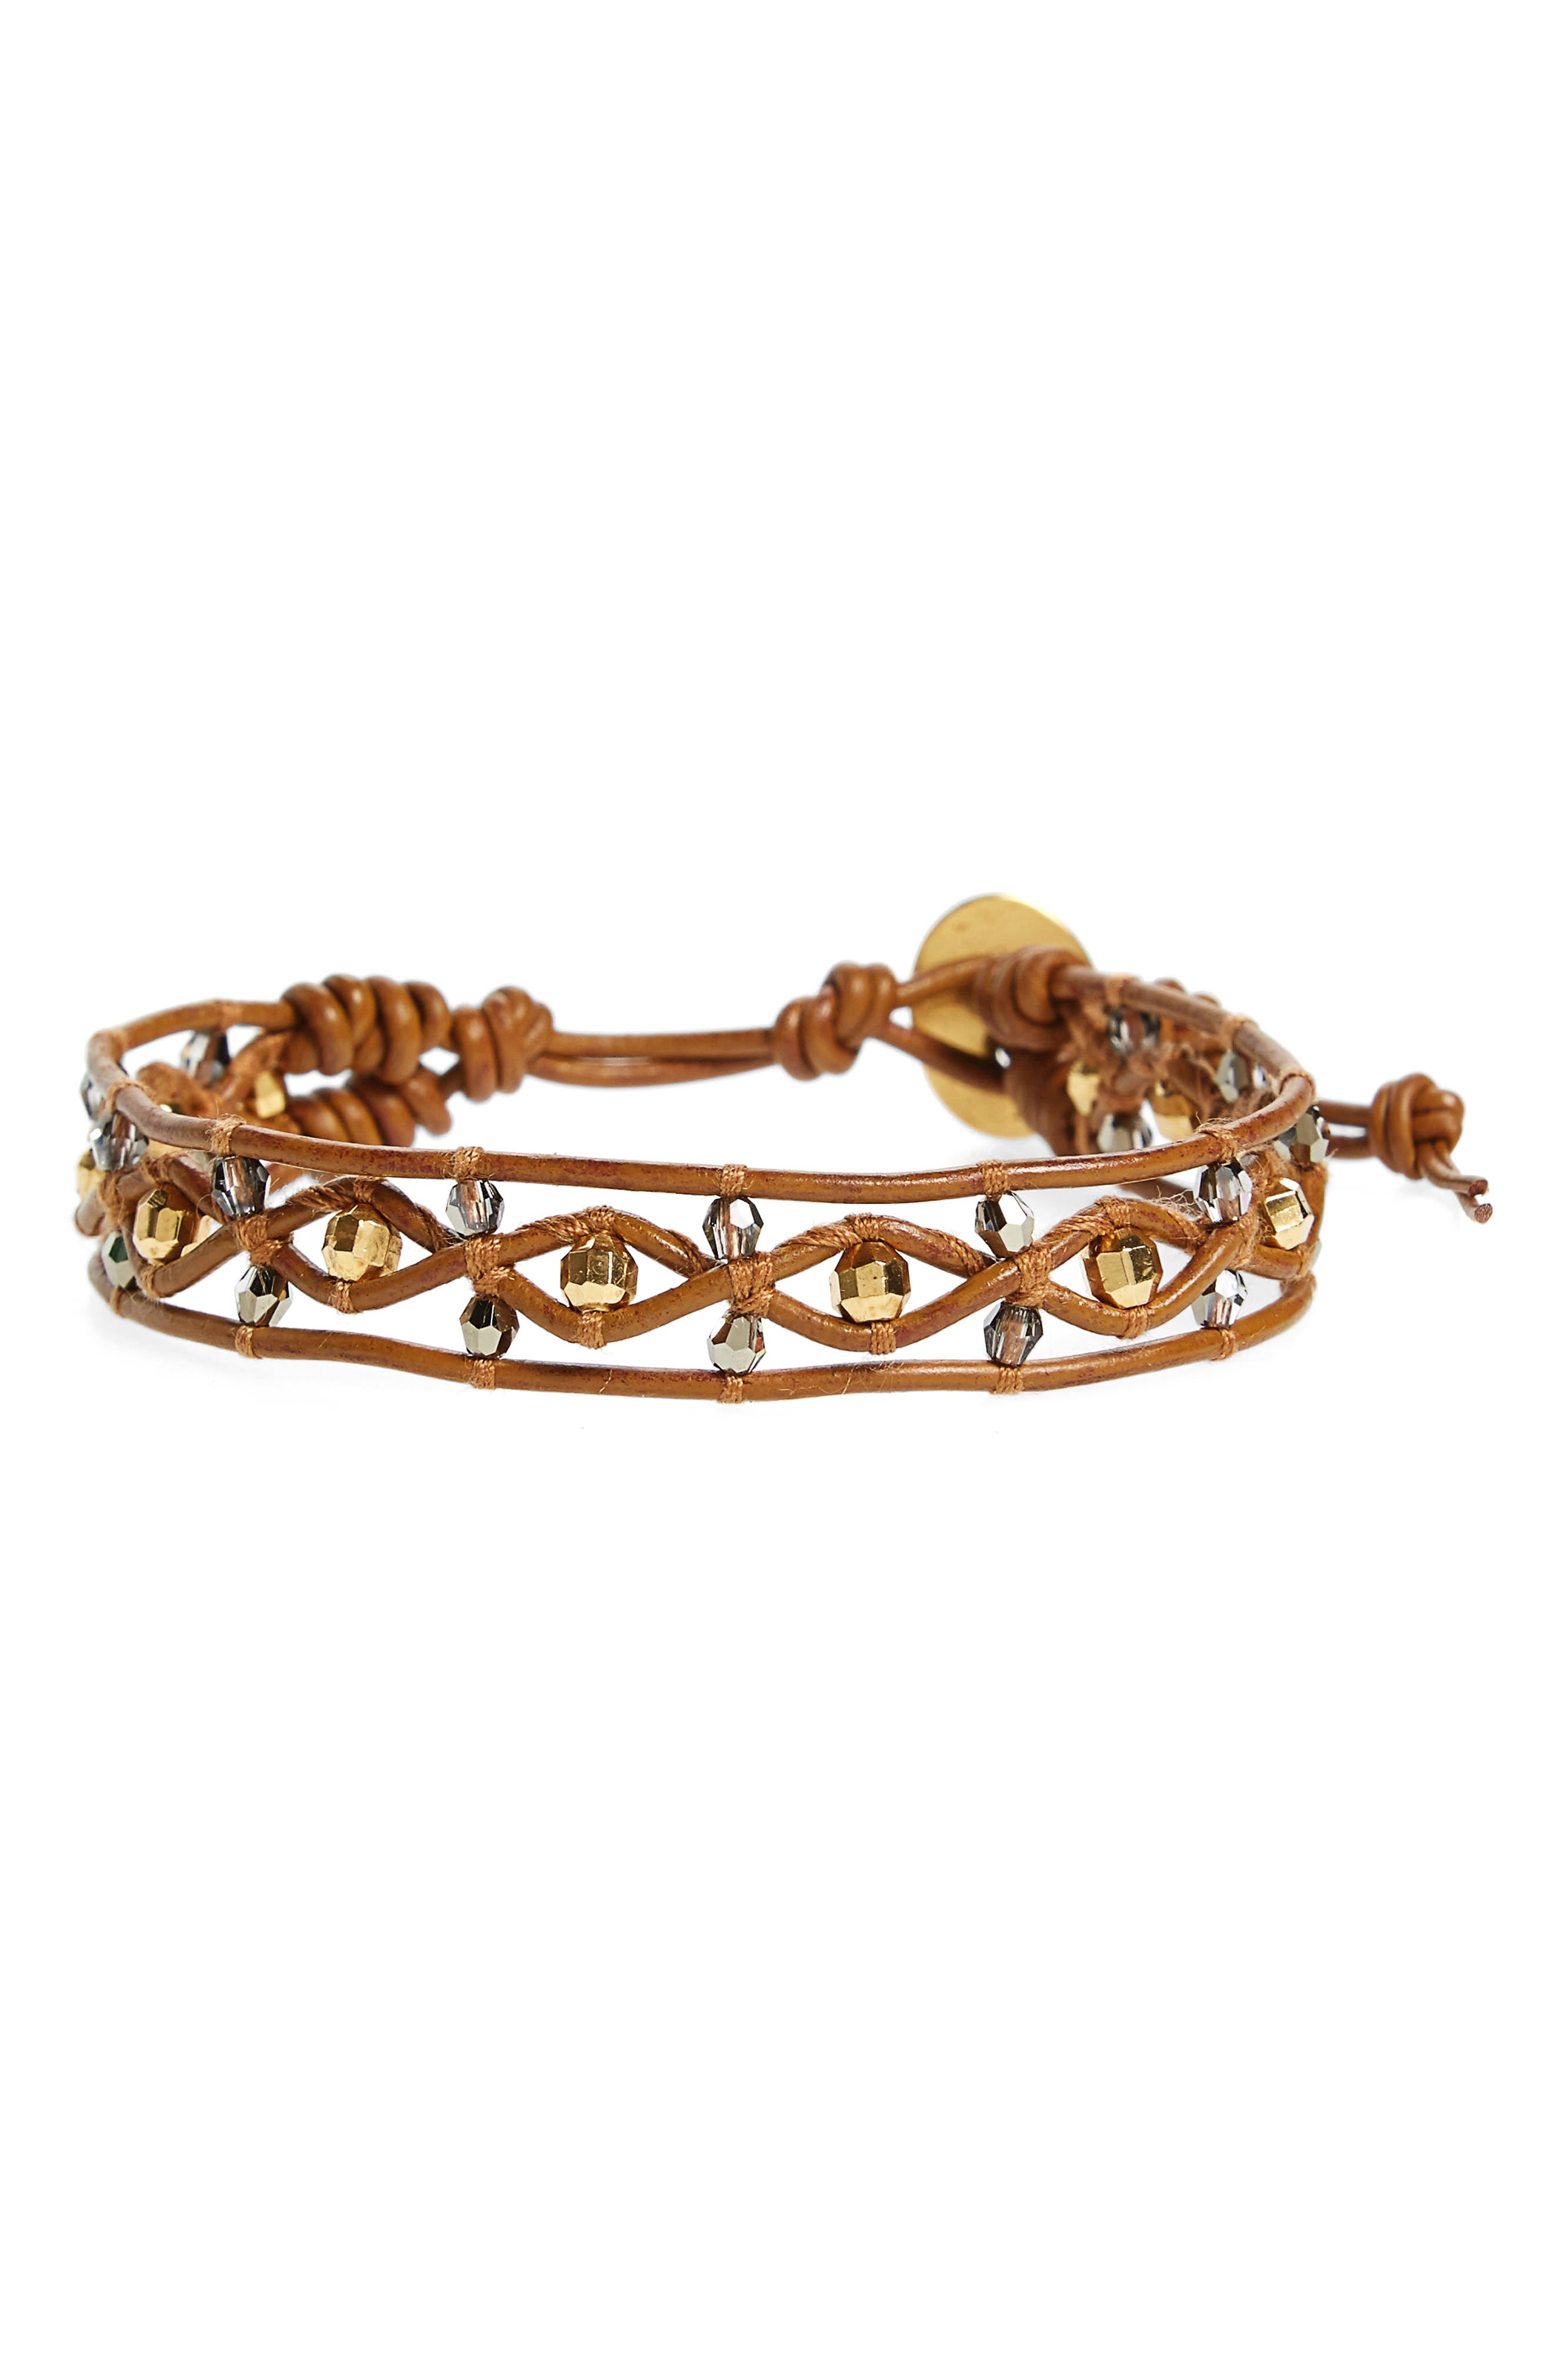 Beaded Leather Bracelet,                             Main thumbnail 1, color,                             710